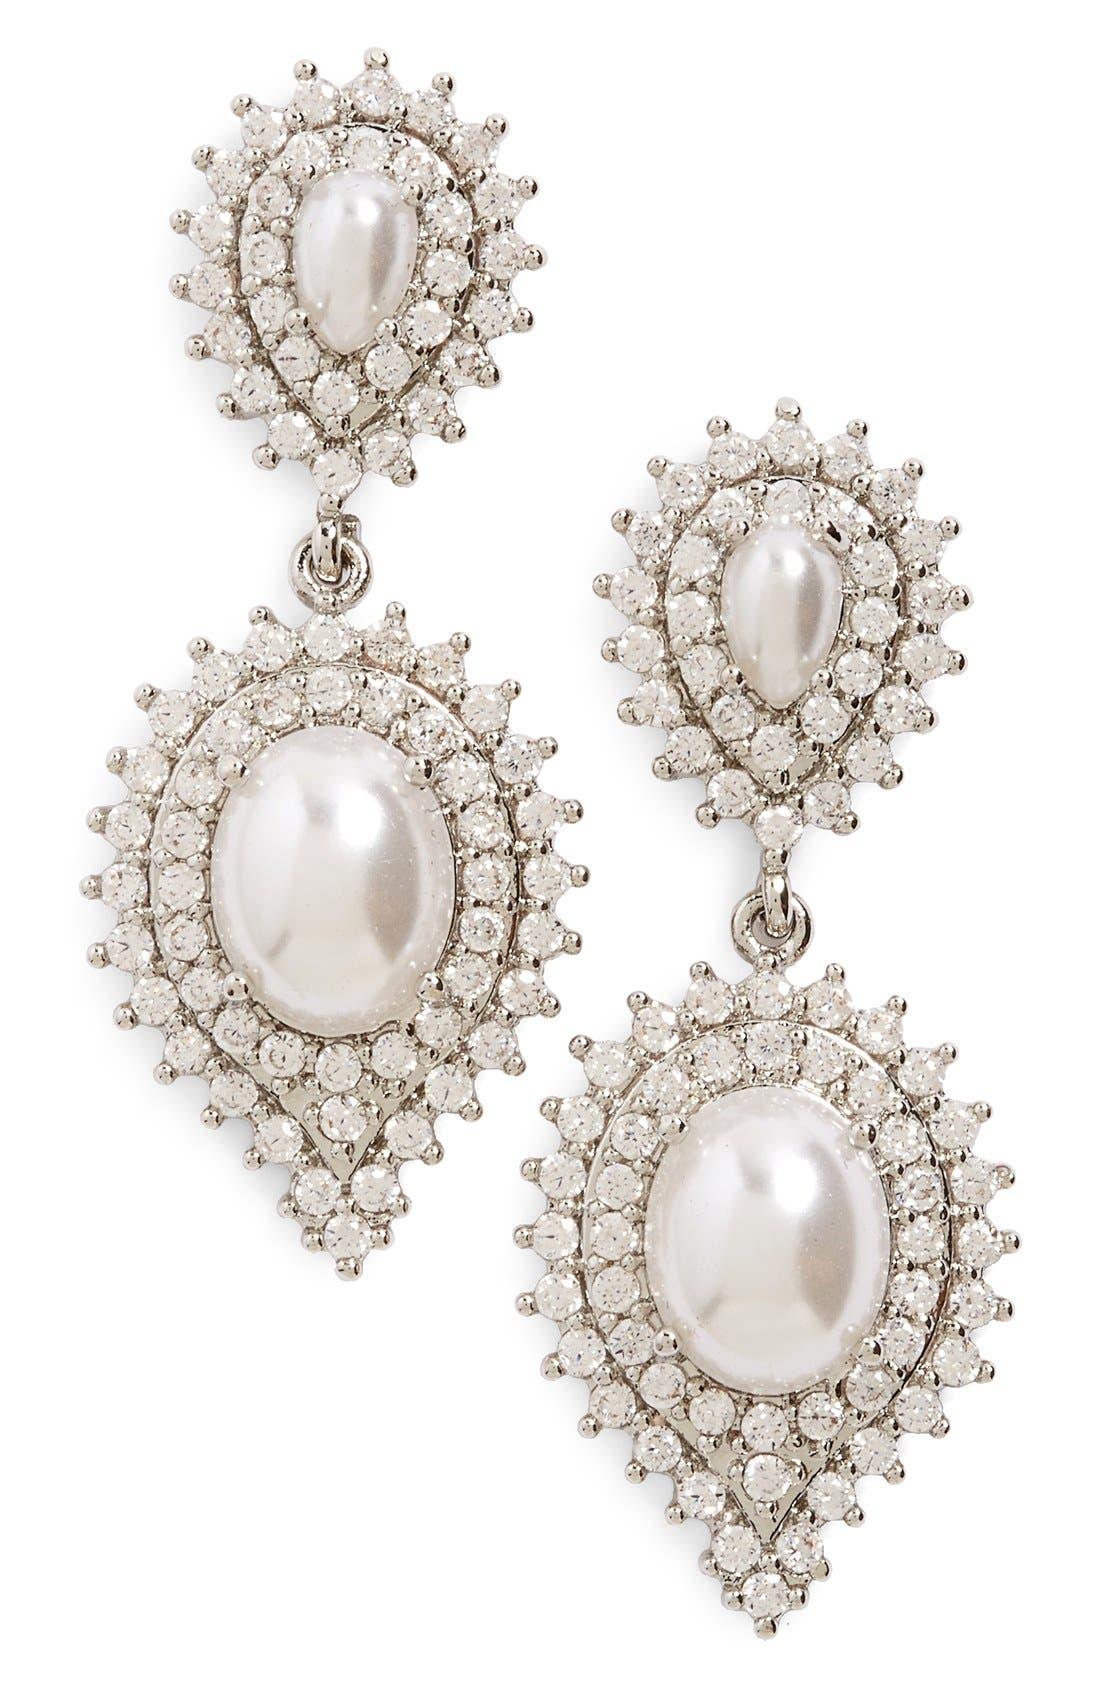 Main Image - Samantha Wills 'Velvet Nights' Faux-Pearl Drop Earrings